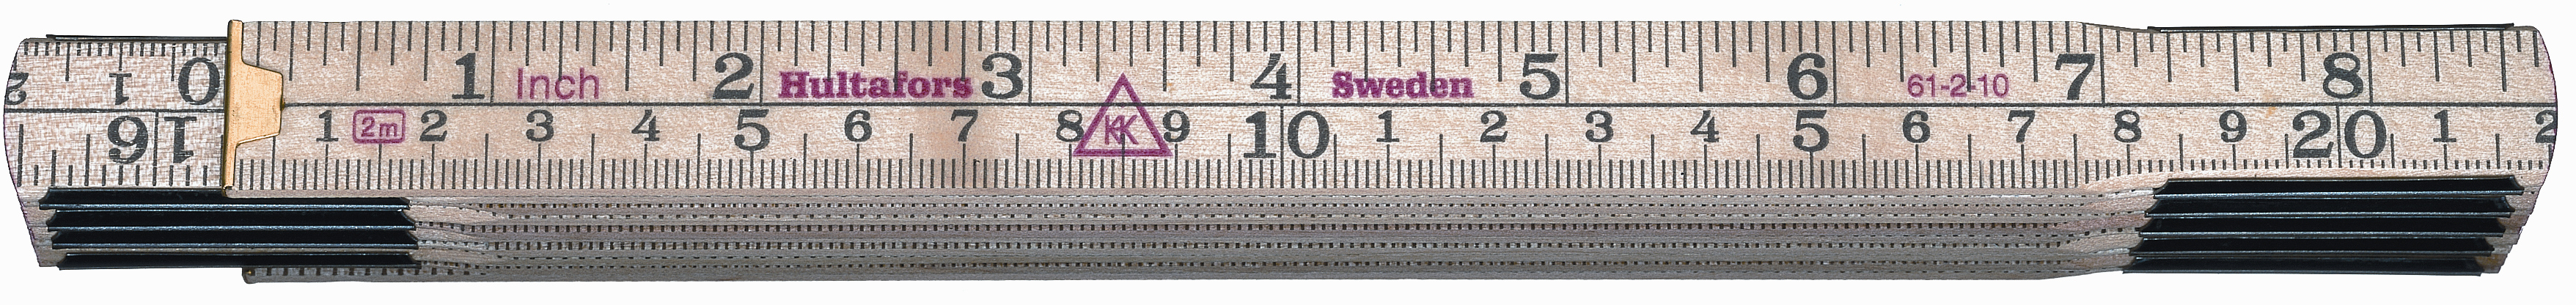 Hultafors Folding Rule 61 — 2m, 10 sections HU-100504